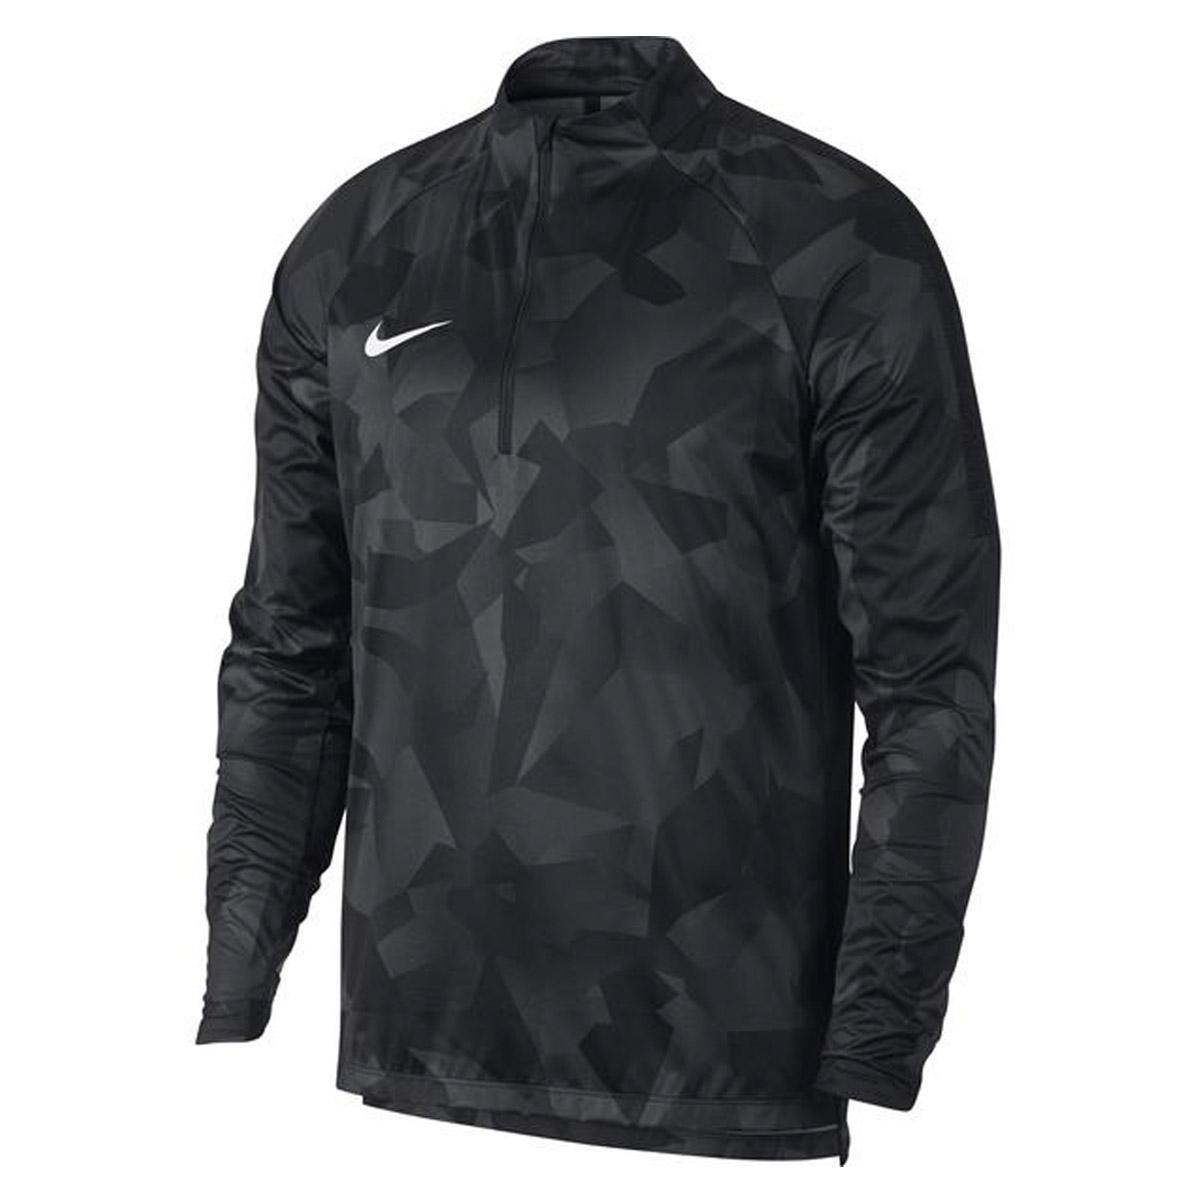 ebcec2dc187 Nike Shield Squad Dril Trainingstop WIT/ZWART online kopen bij ...